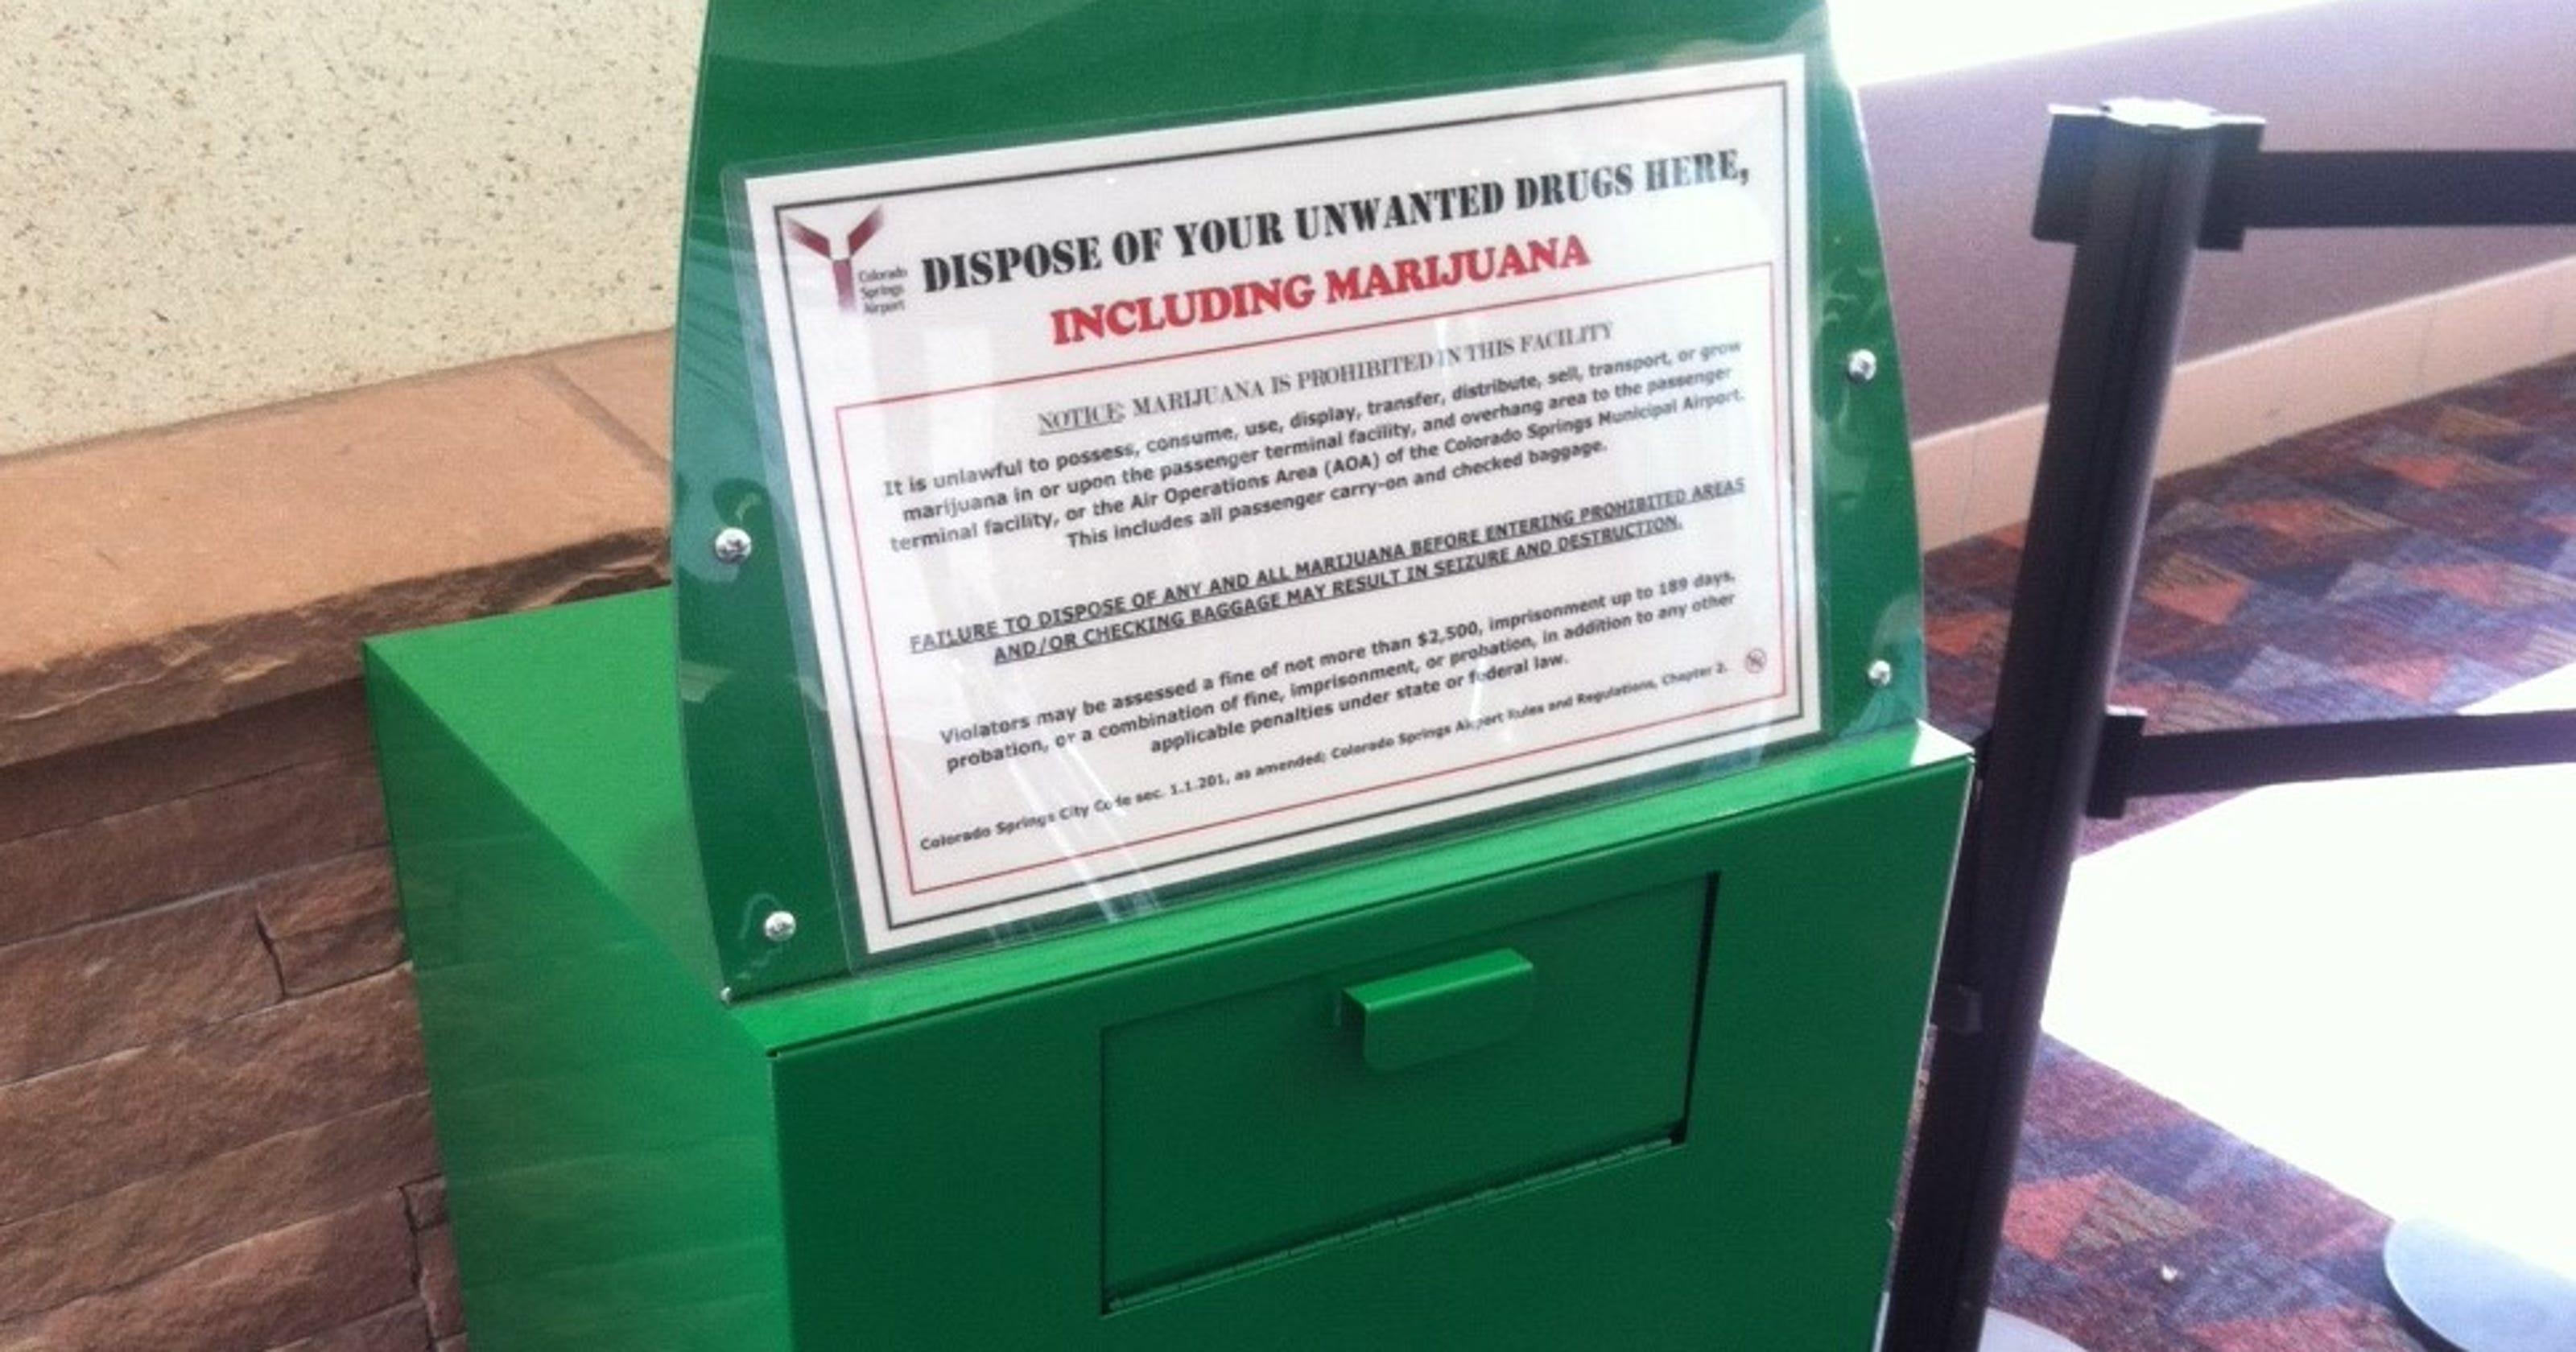 Marijuana at airports: Colo , Wash  adjust to new laws